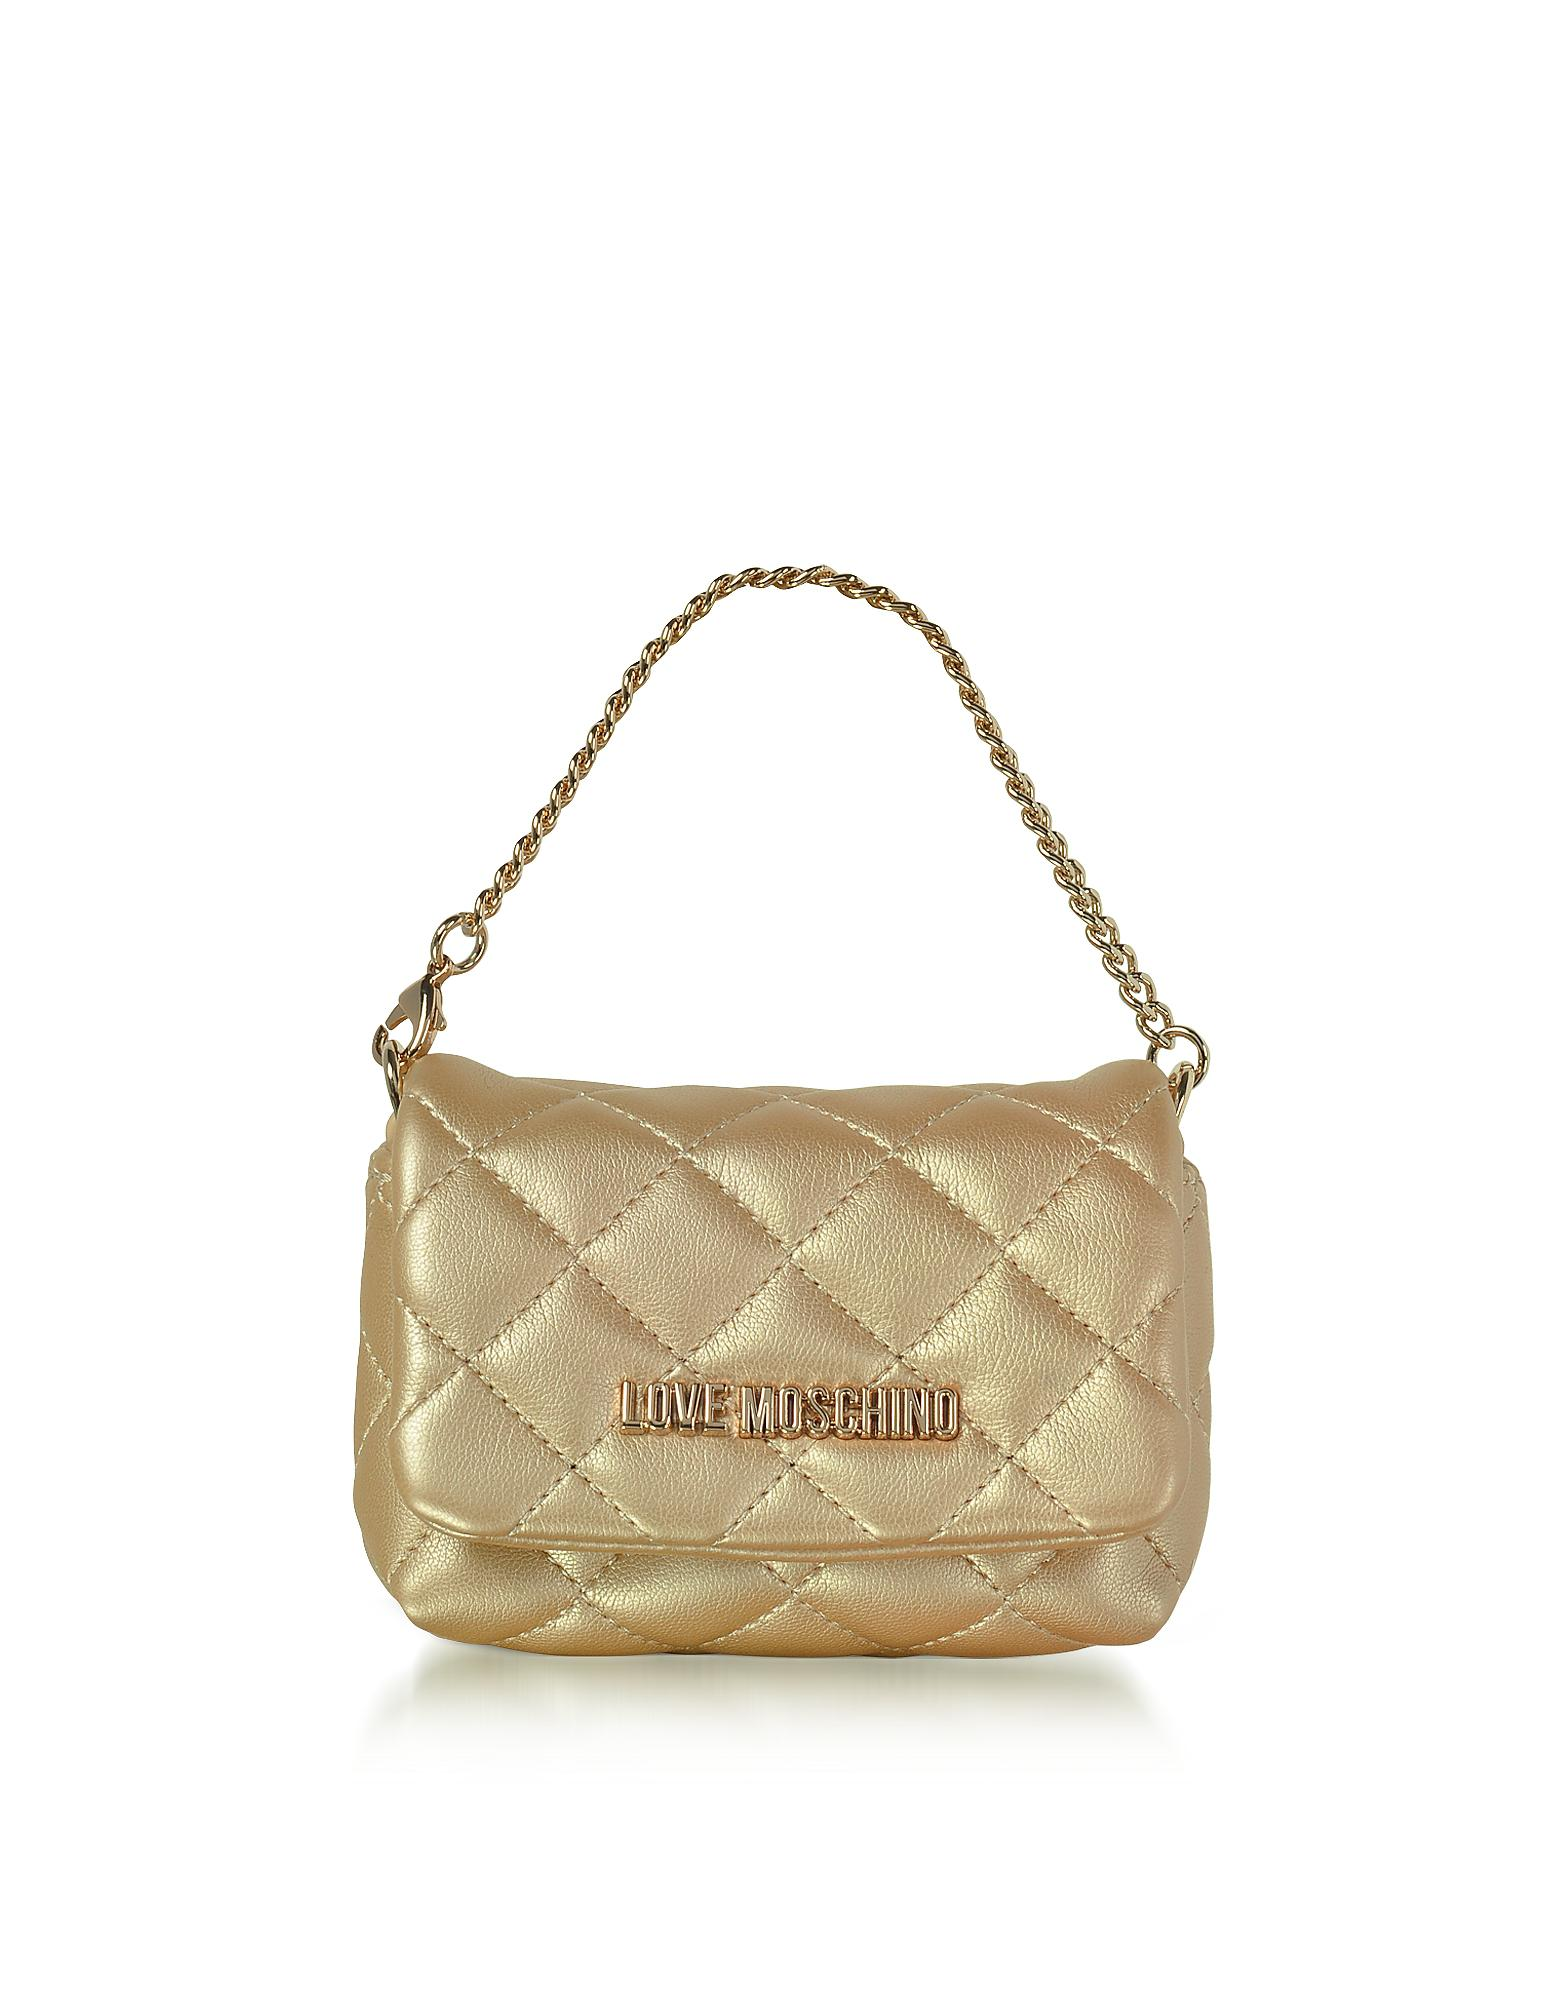 22f6215aba Love Moschino Mini Bag Gold Eco-leather Clutch in Metallic - Lyst